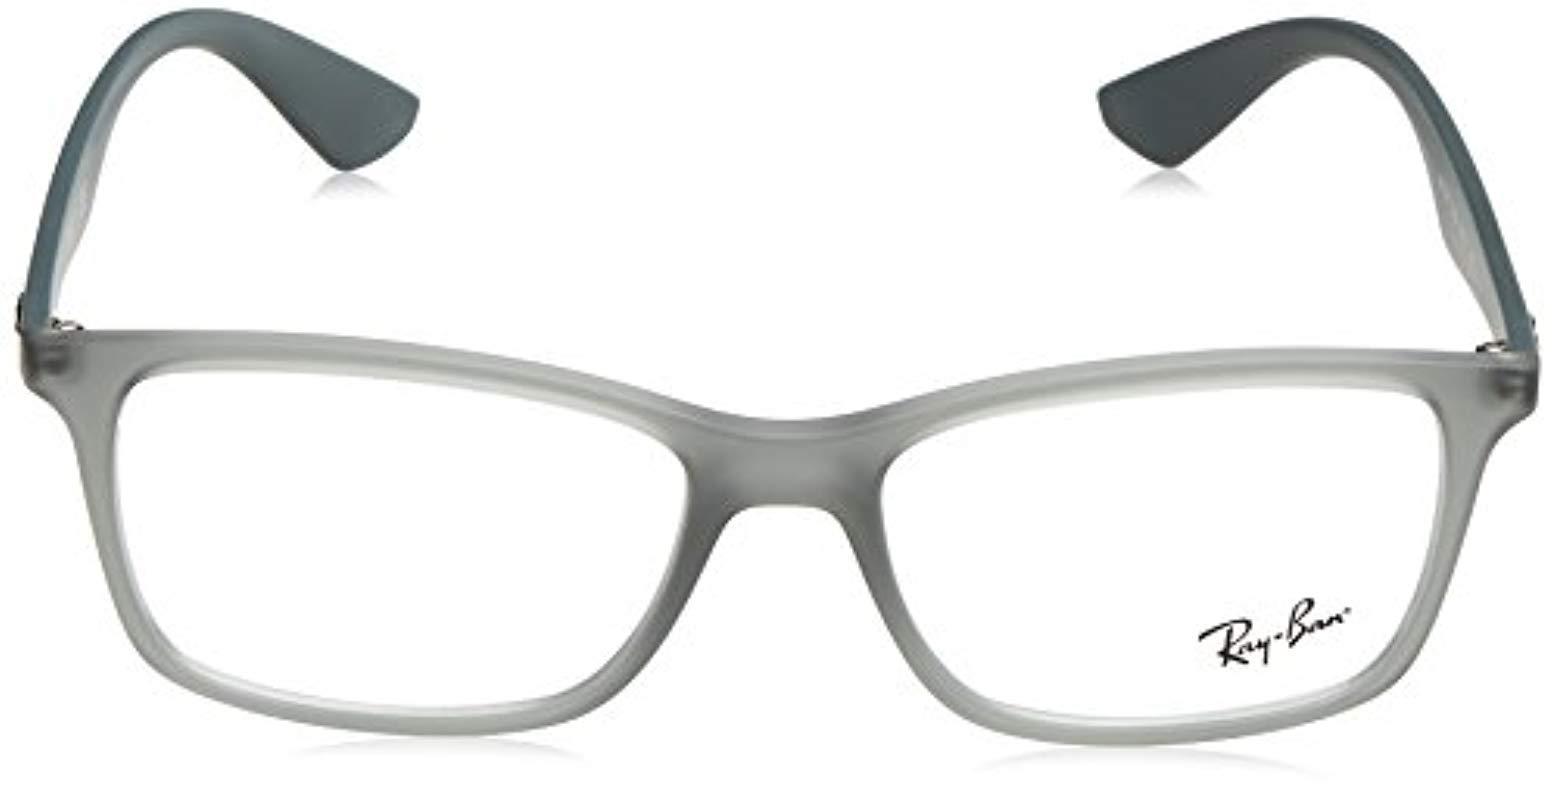 34c221ec16 Ray-Ban - Gray Rx7047 Eyeglasses for Men - Lyst. View fullscreen